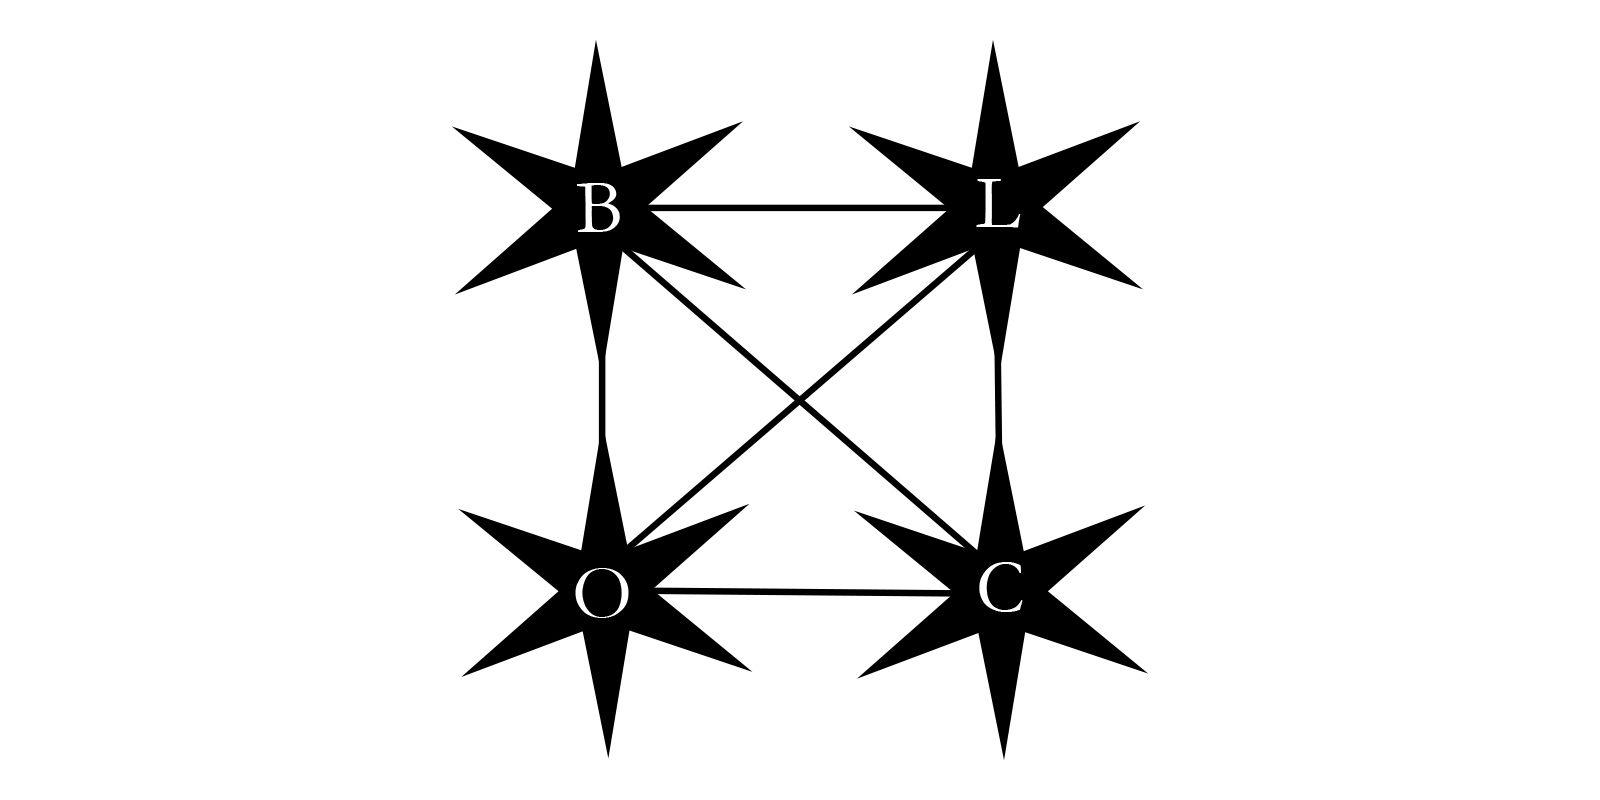 Bloc - Blockchain Lawyers of Chicago